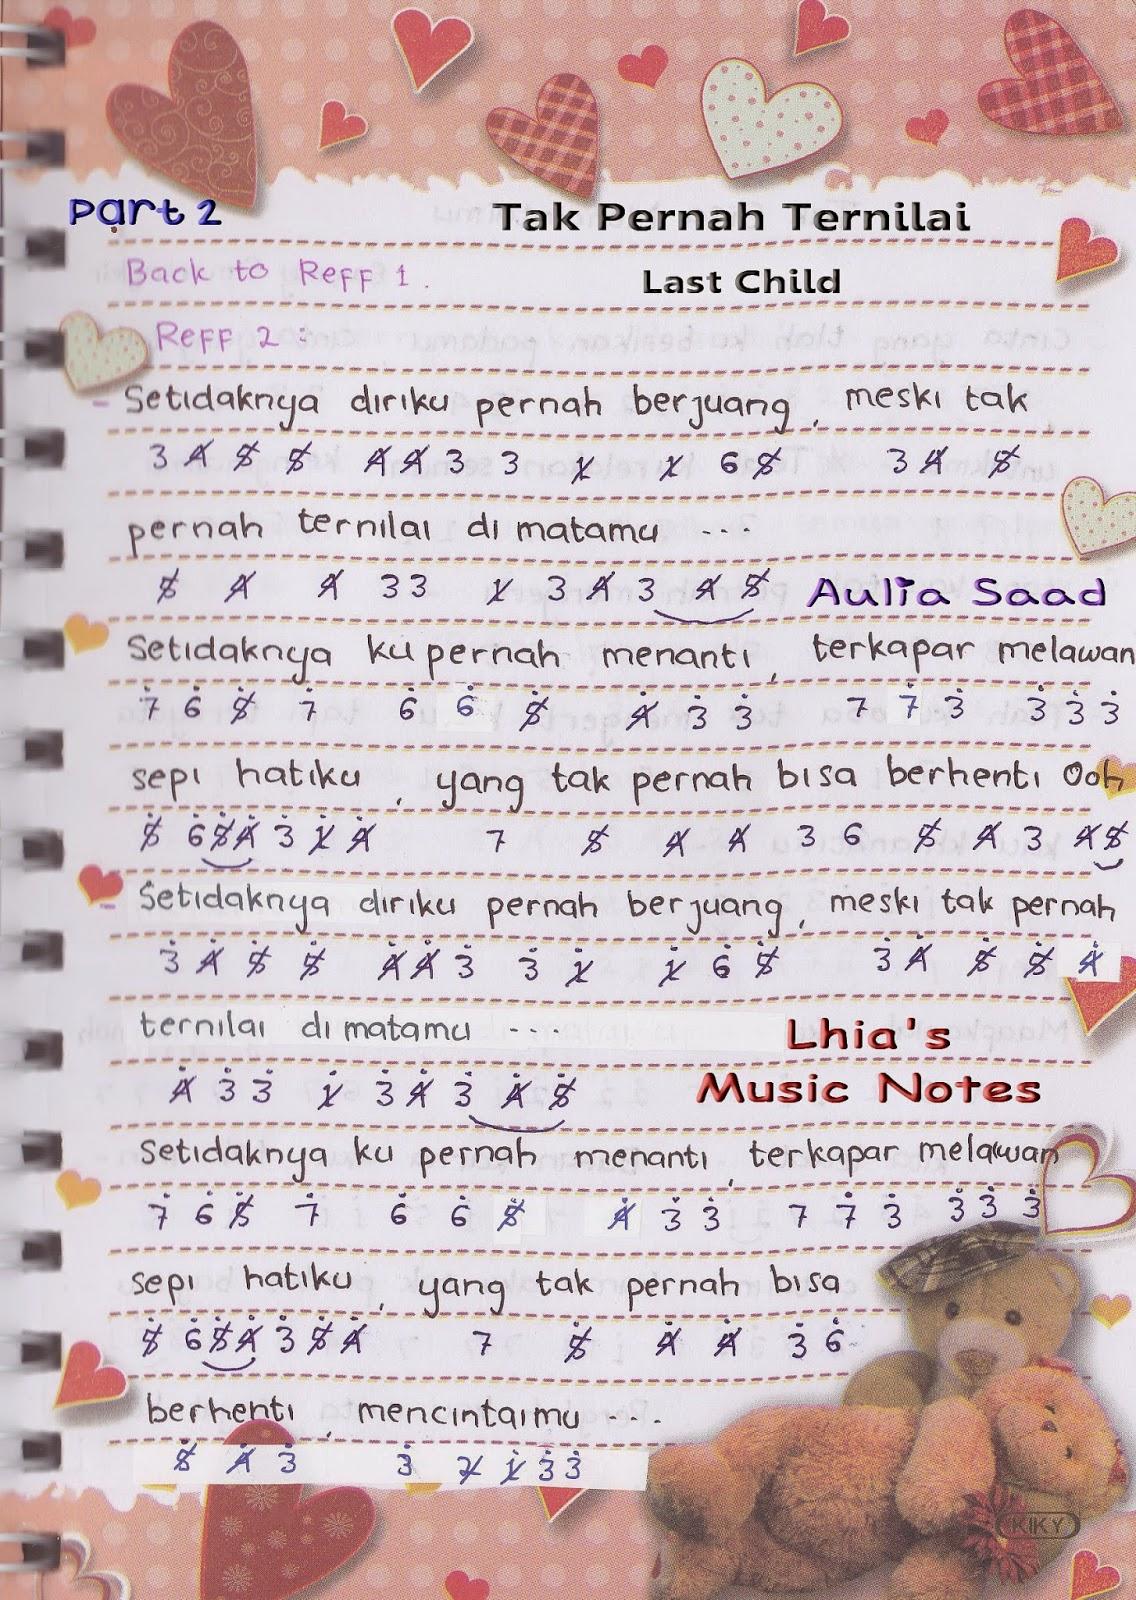 Last Child Tak Pernah Ternilai Chord : child, pernah, ternilai, chord, Piano, Pemula, Child, Pernah, Ternilai, Lhia's, Music, Notes